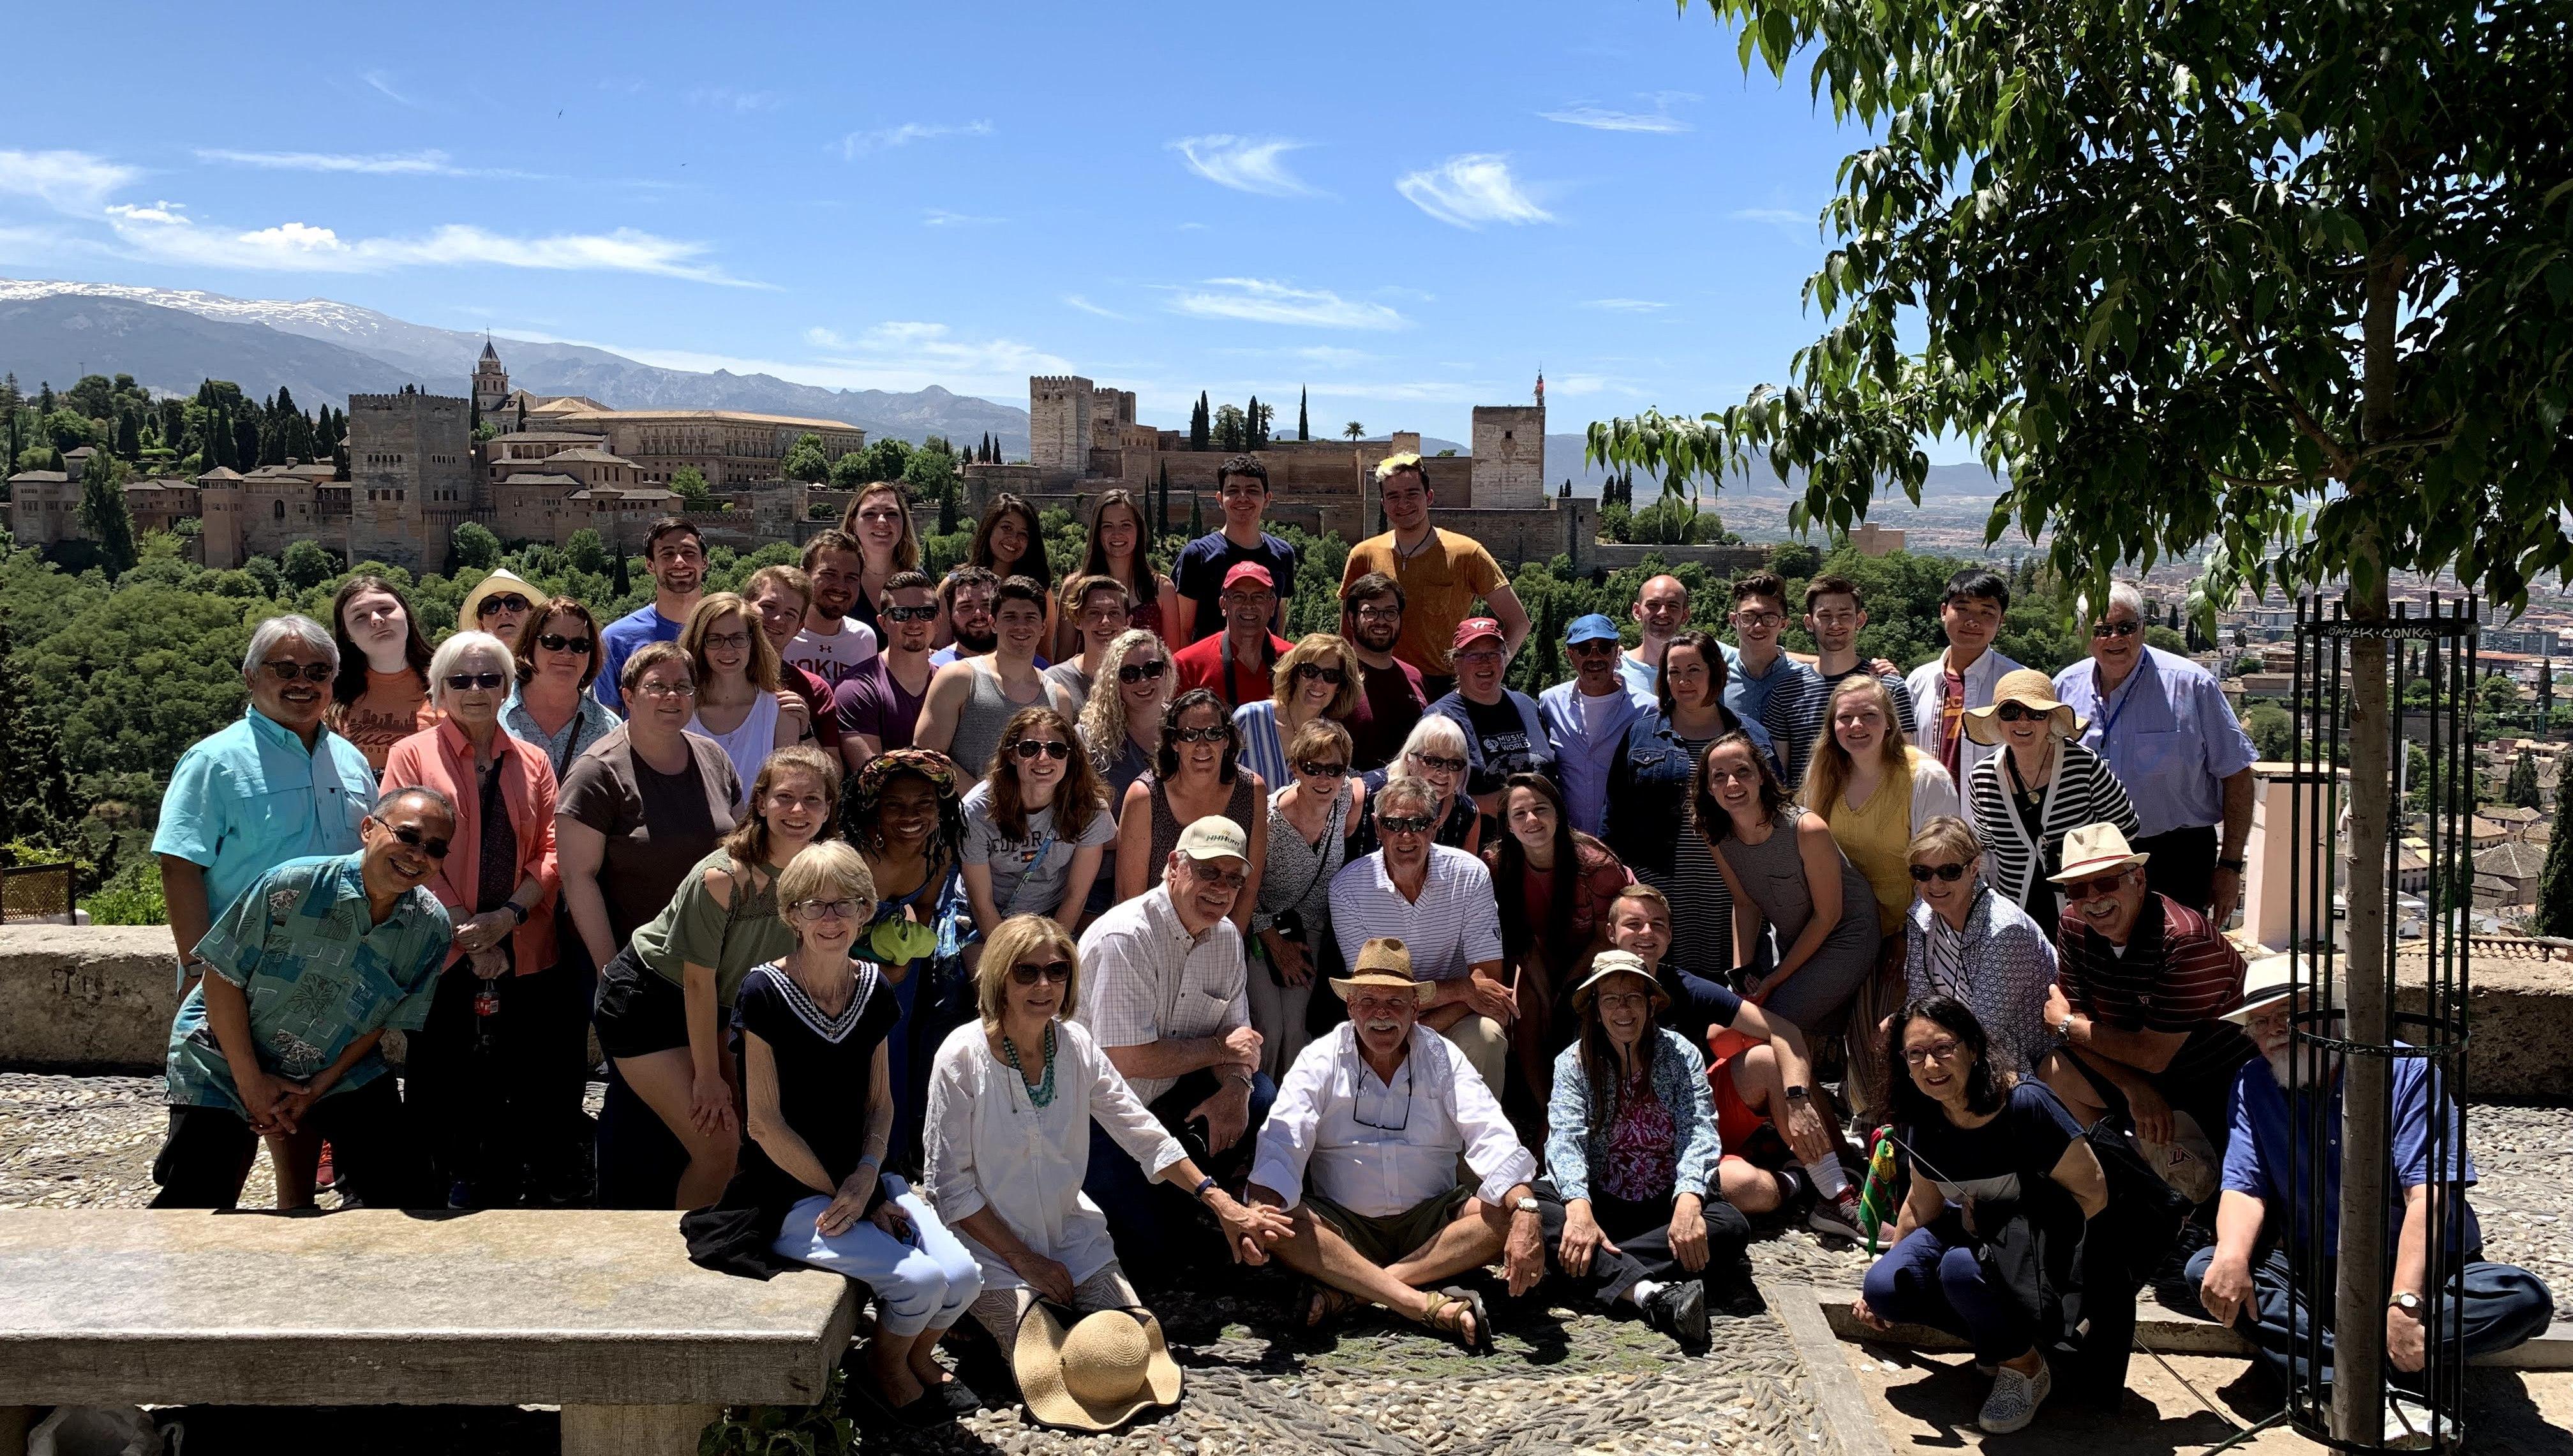 VT Chamber Singers and Blacksburg Master Chorale perform in Granada, Spain (2019)